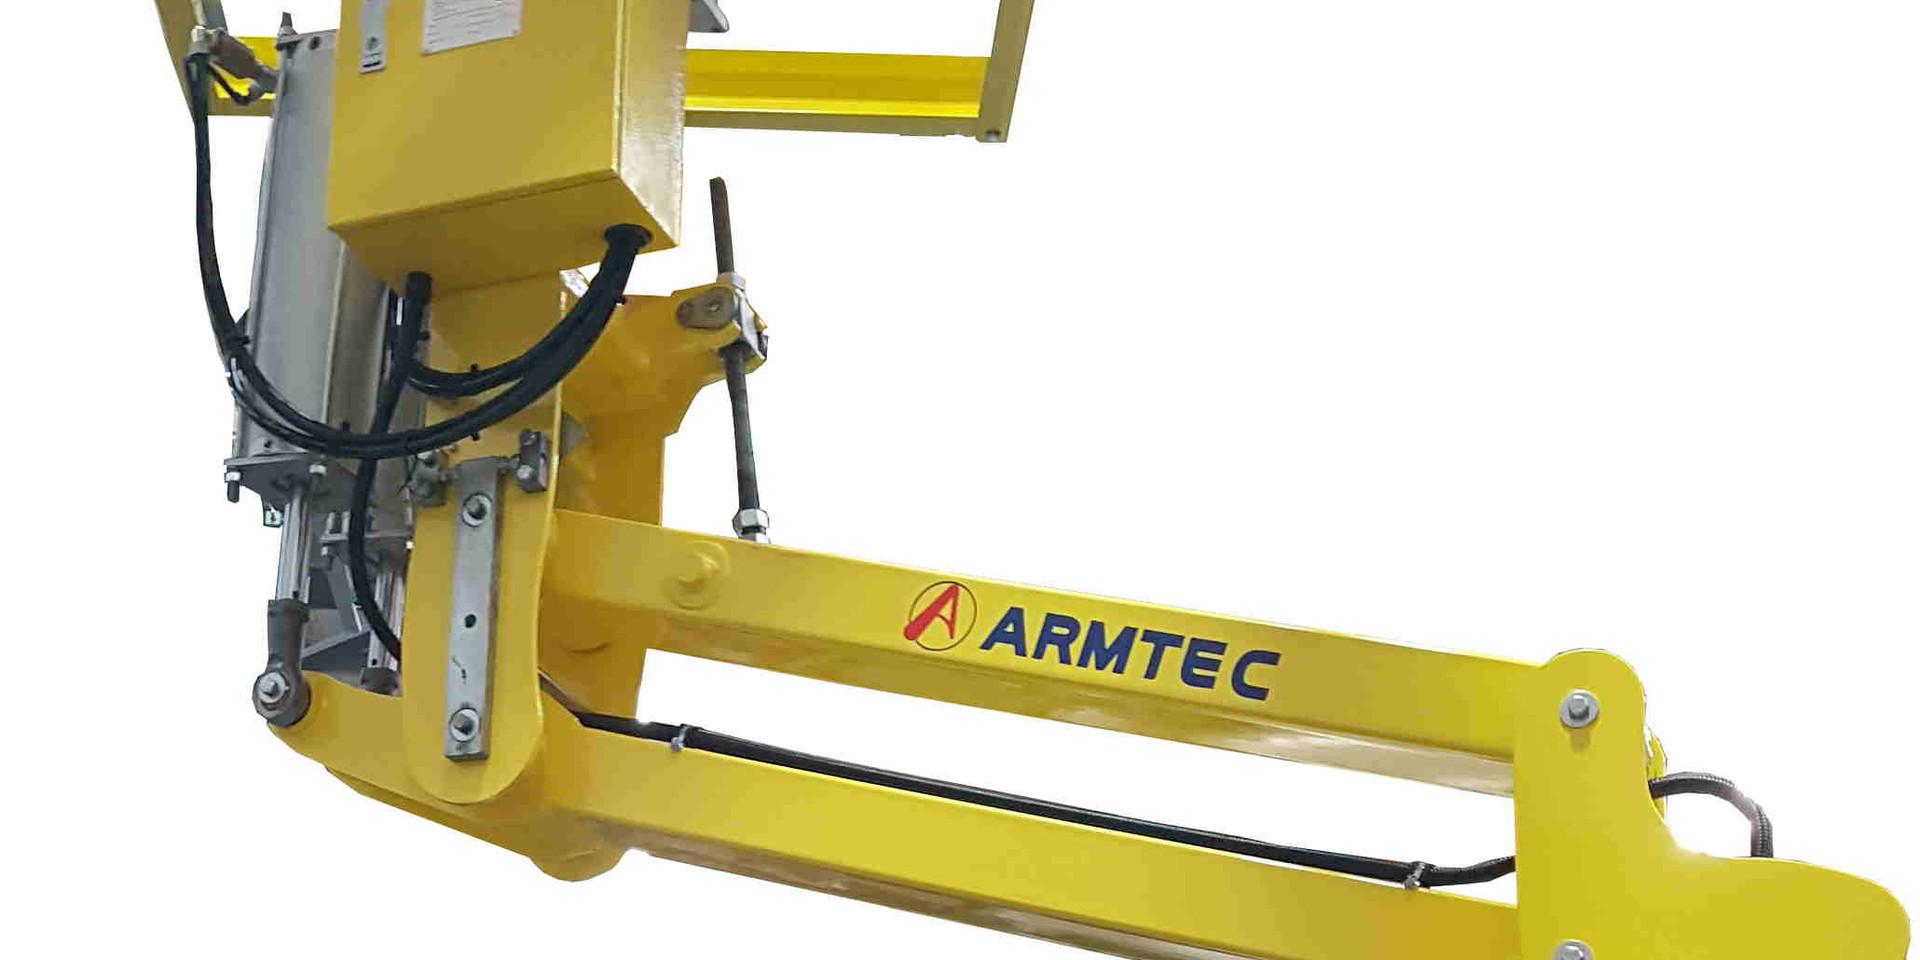 Armtec RA200 Overhead